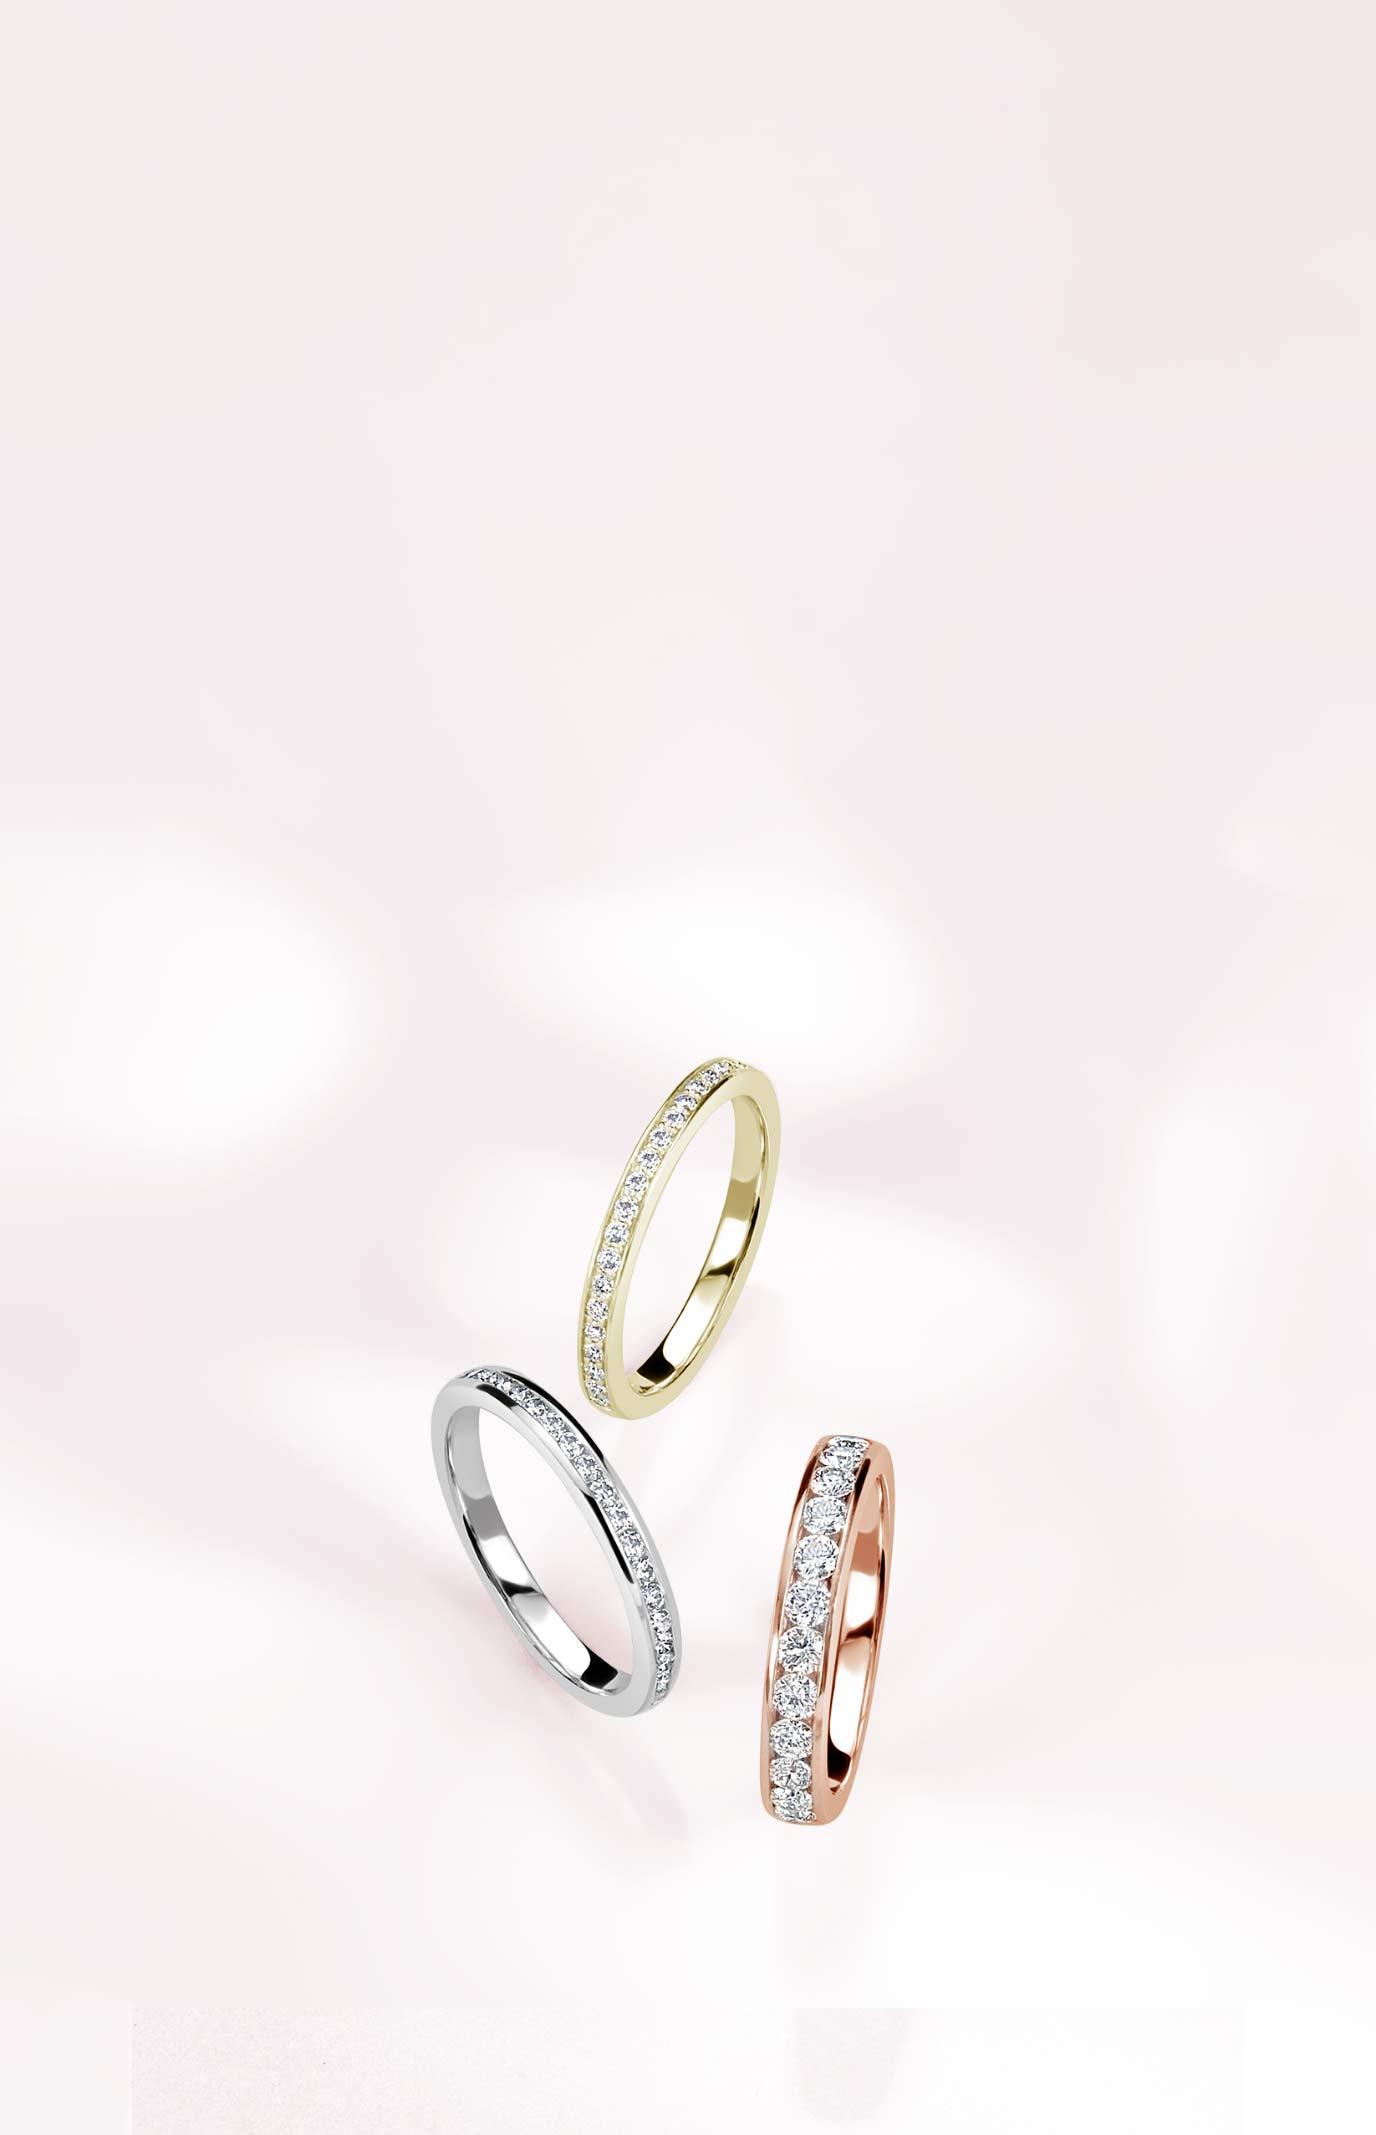 Diamond Wedding Rings | Diamond Wedding Bands | Bespoke Wedding Rings - Steven Stone